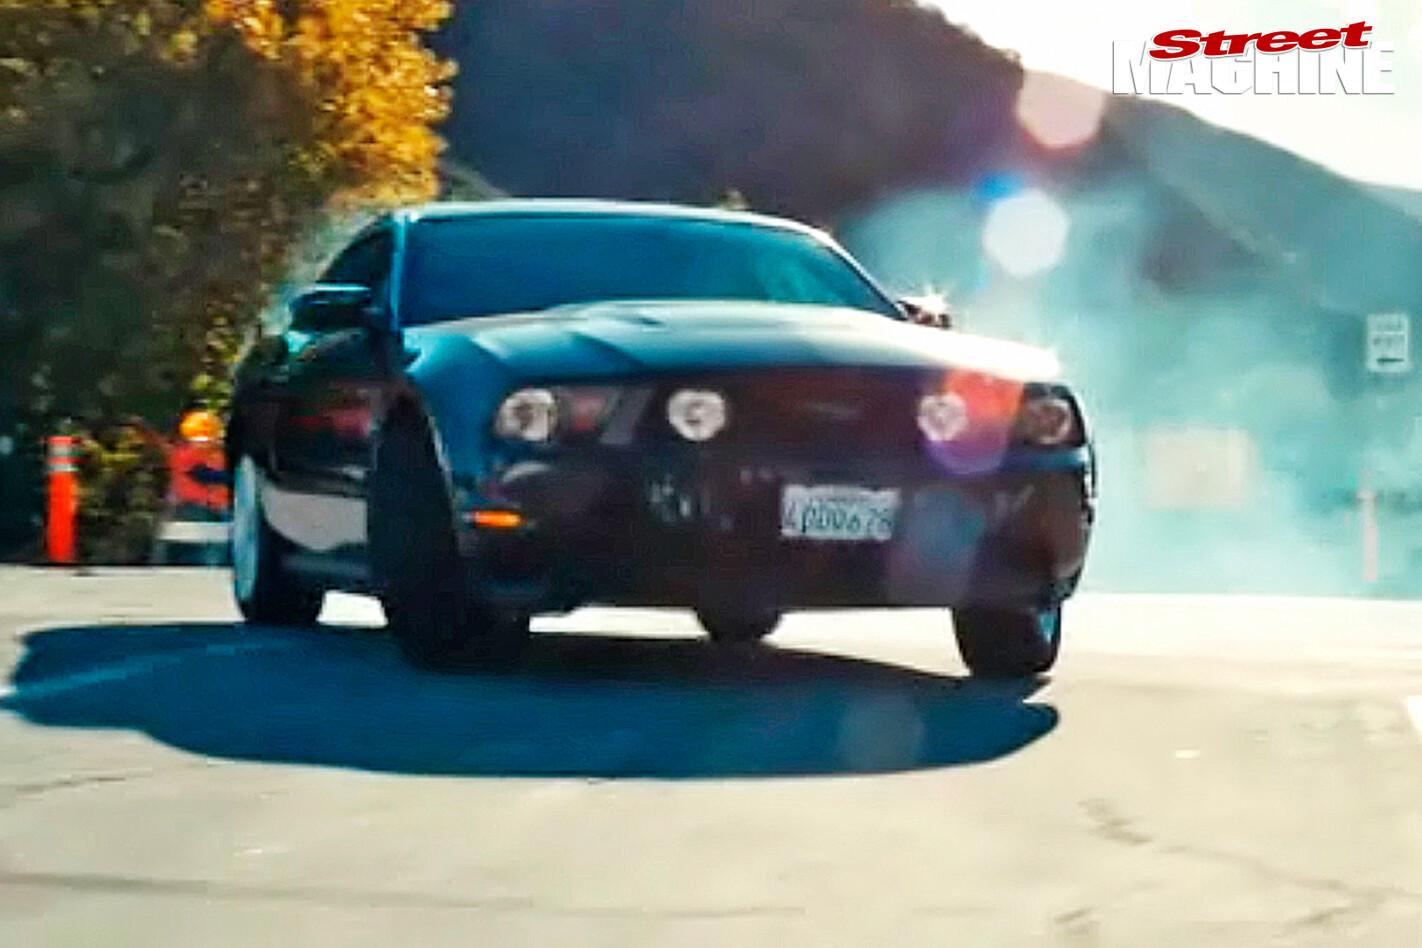 Drive -2011-Ford -Mustang -Ryan -Gosling